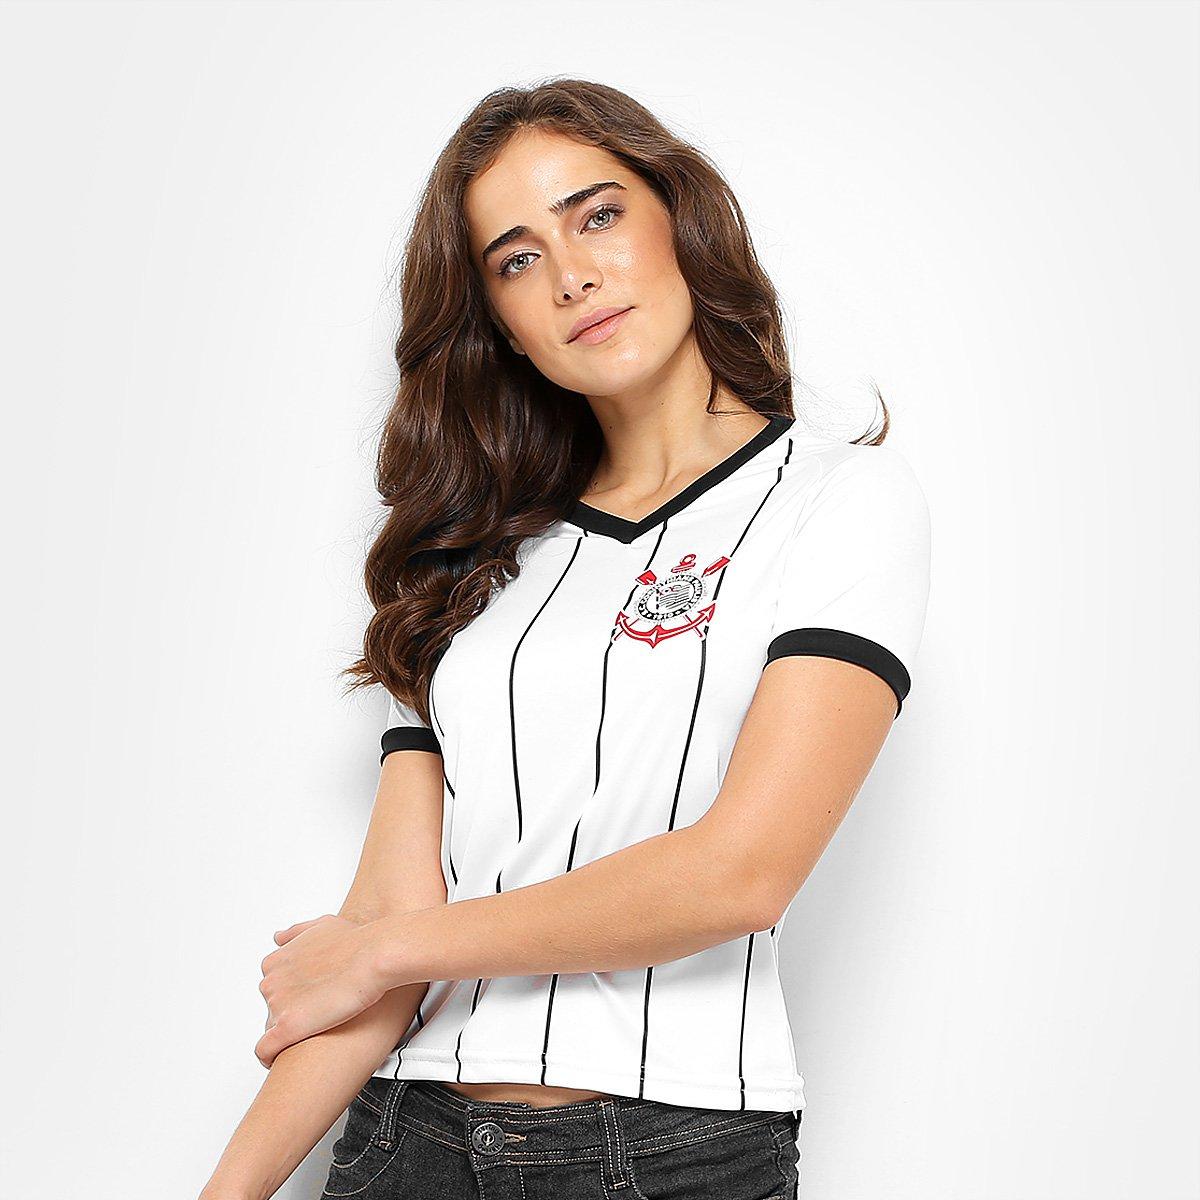 89f5db9fb6 Camisa Corinthians Fenomenal Edição Especial Feminina. undefined